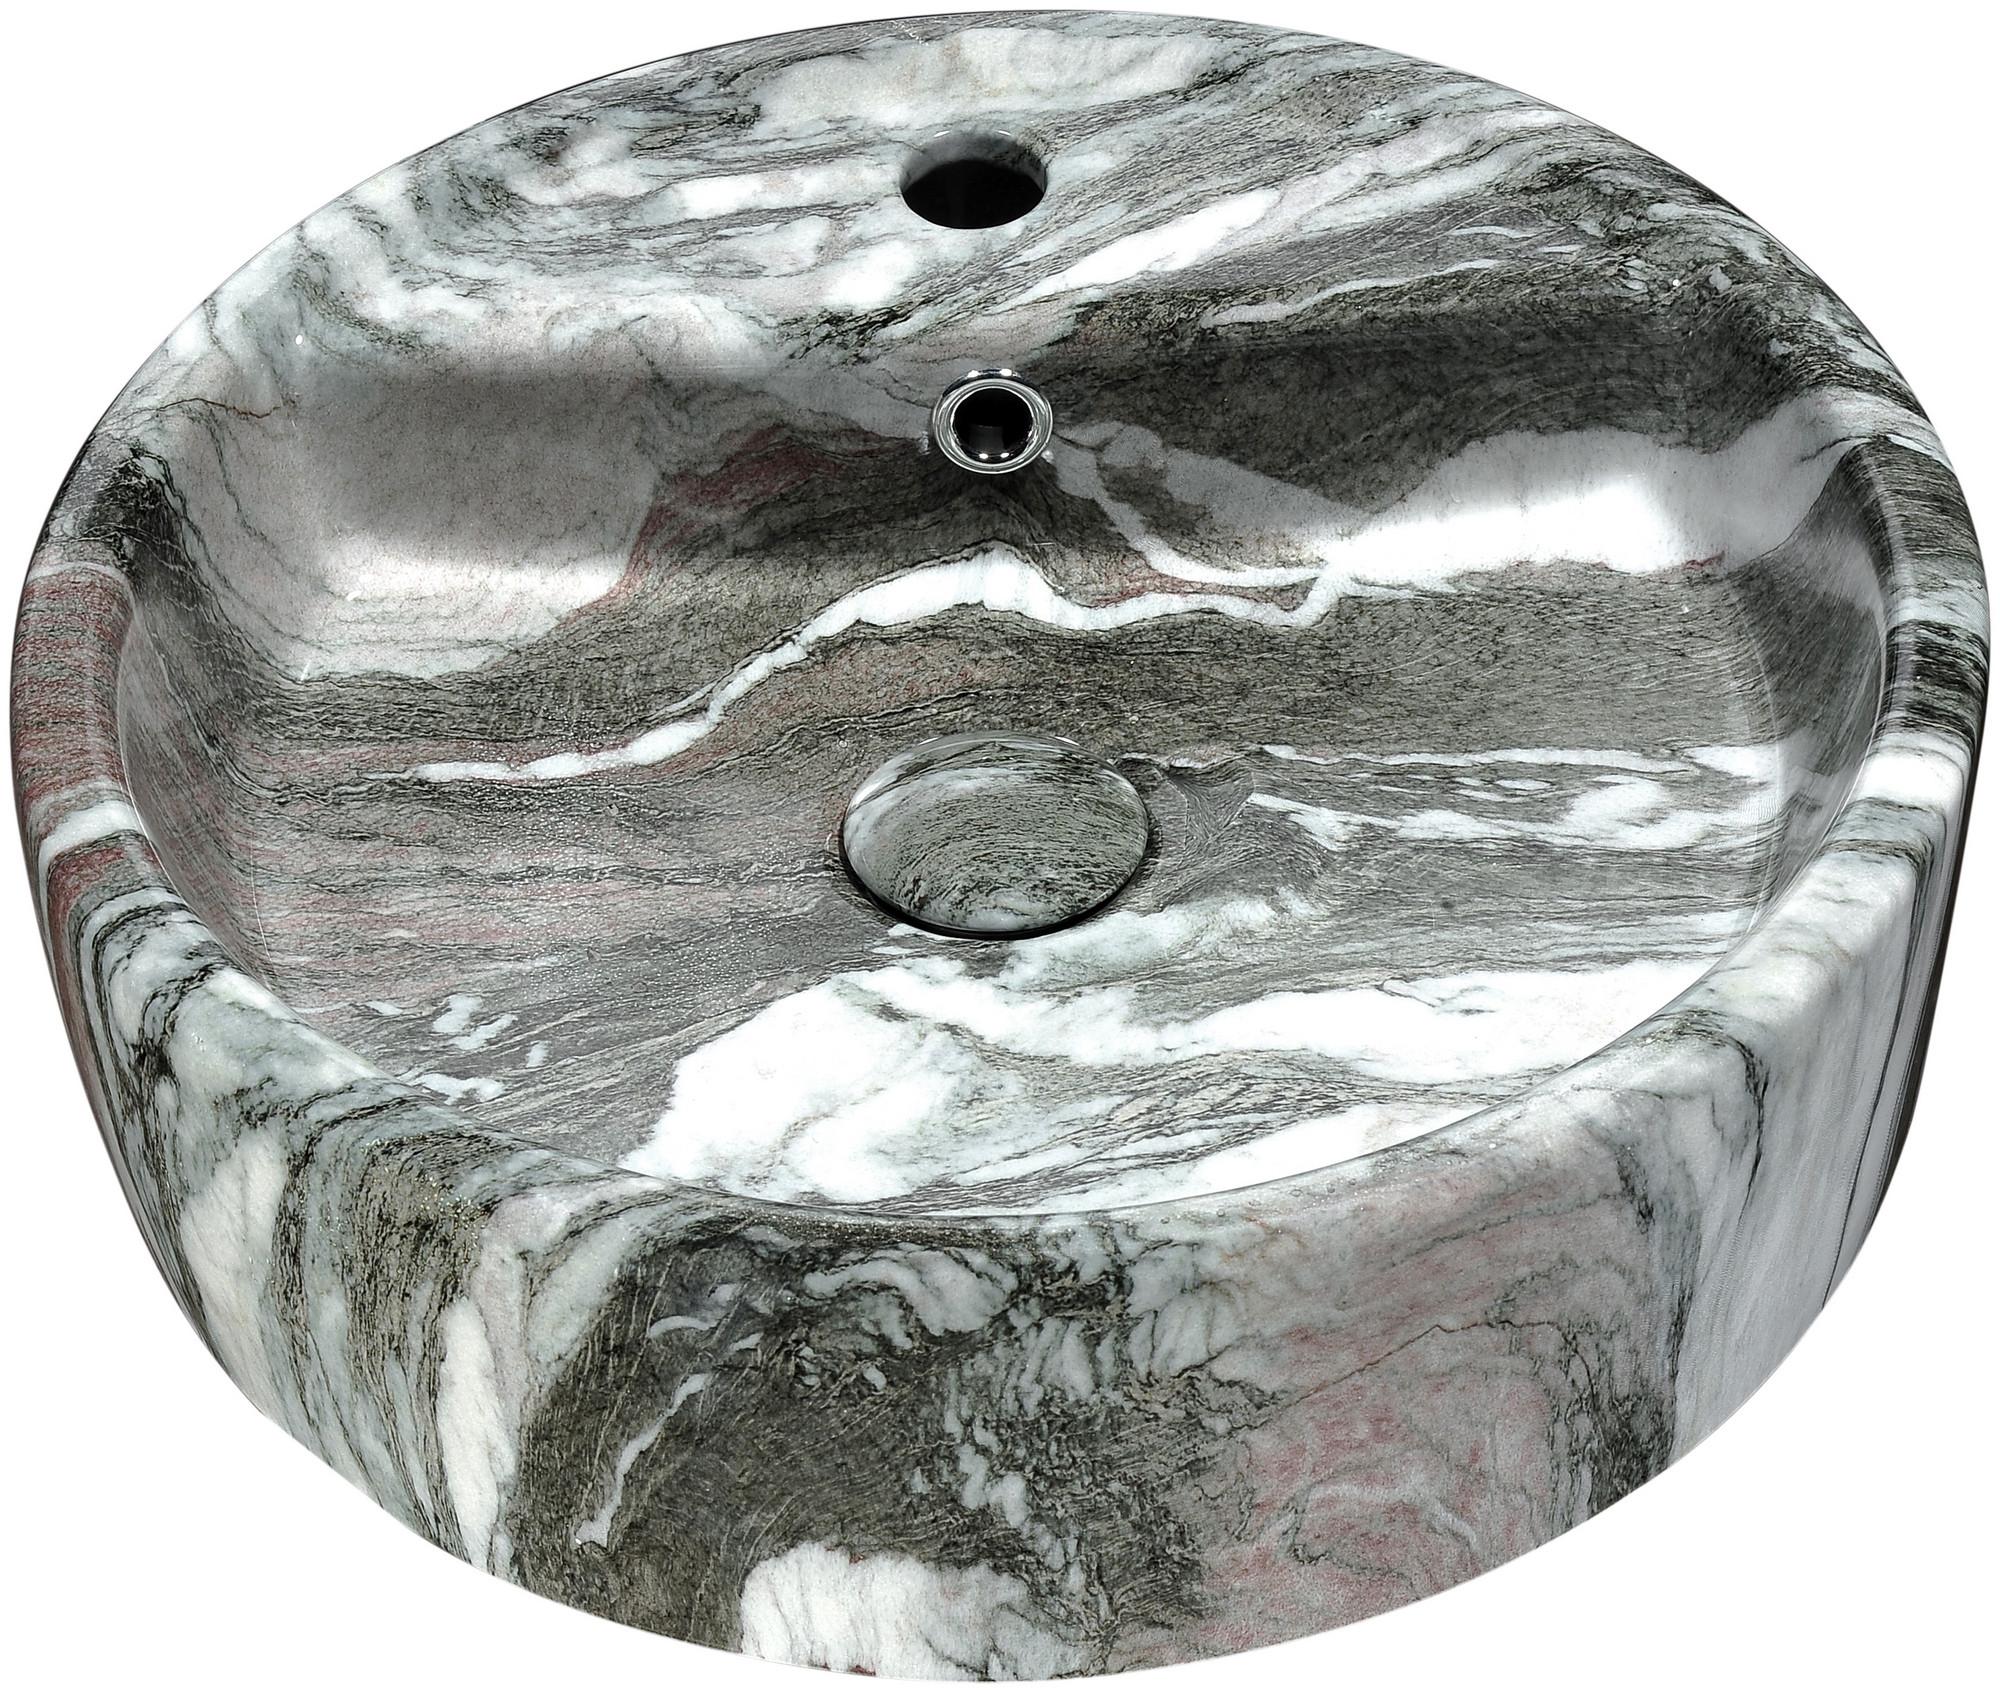 ANZZI LS-AZ254 Rhapsody Series Ceramic Vessel Sink In Neolith Marble Finish